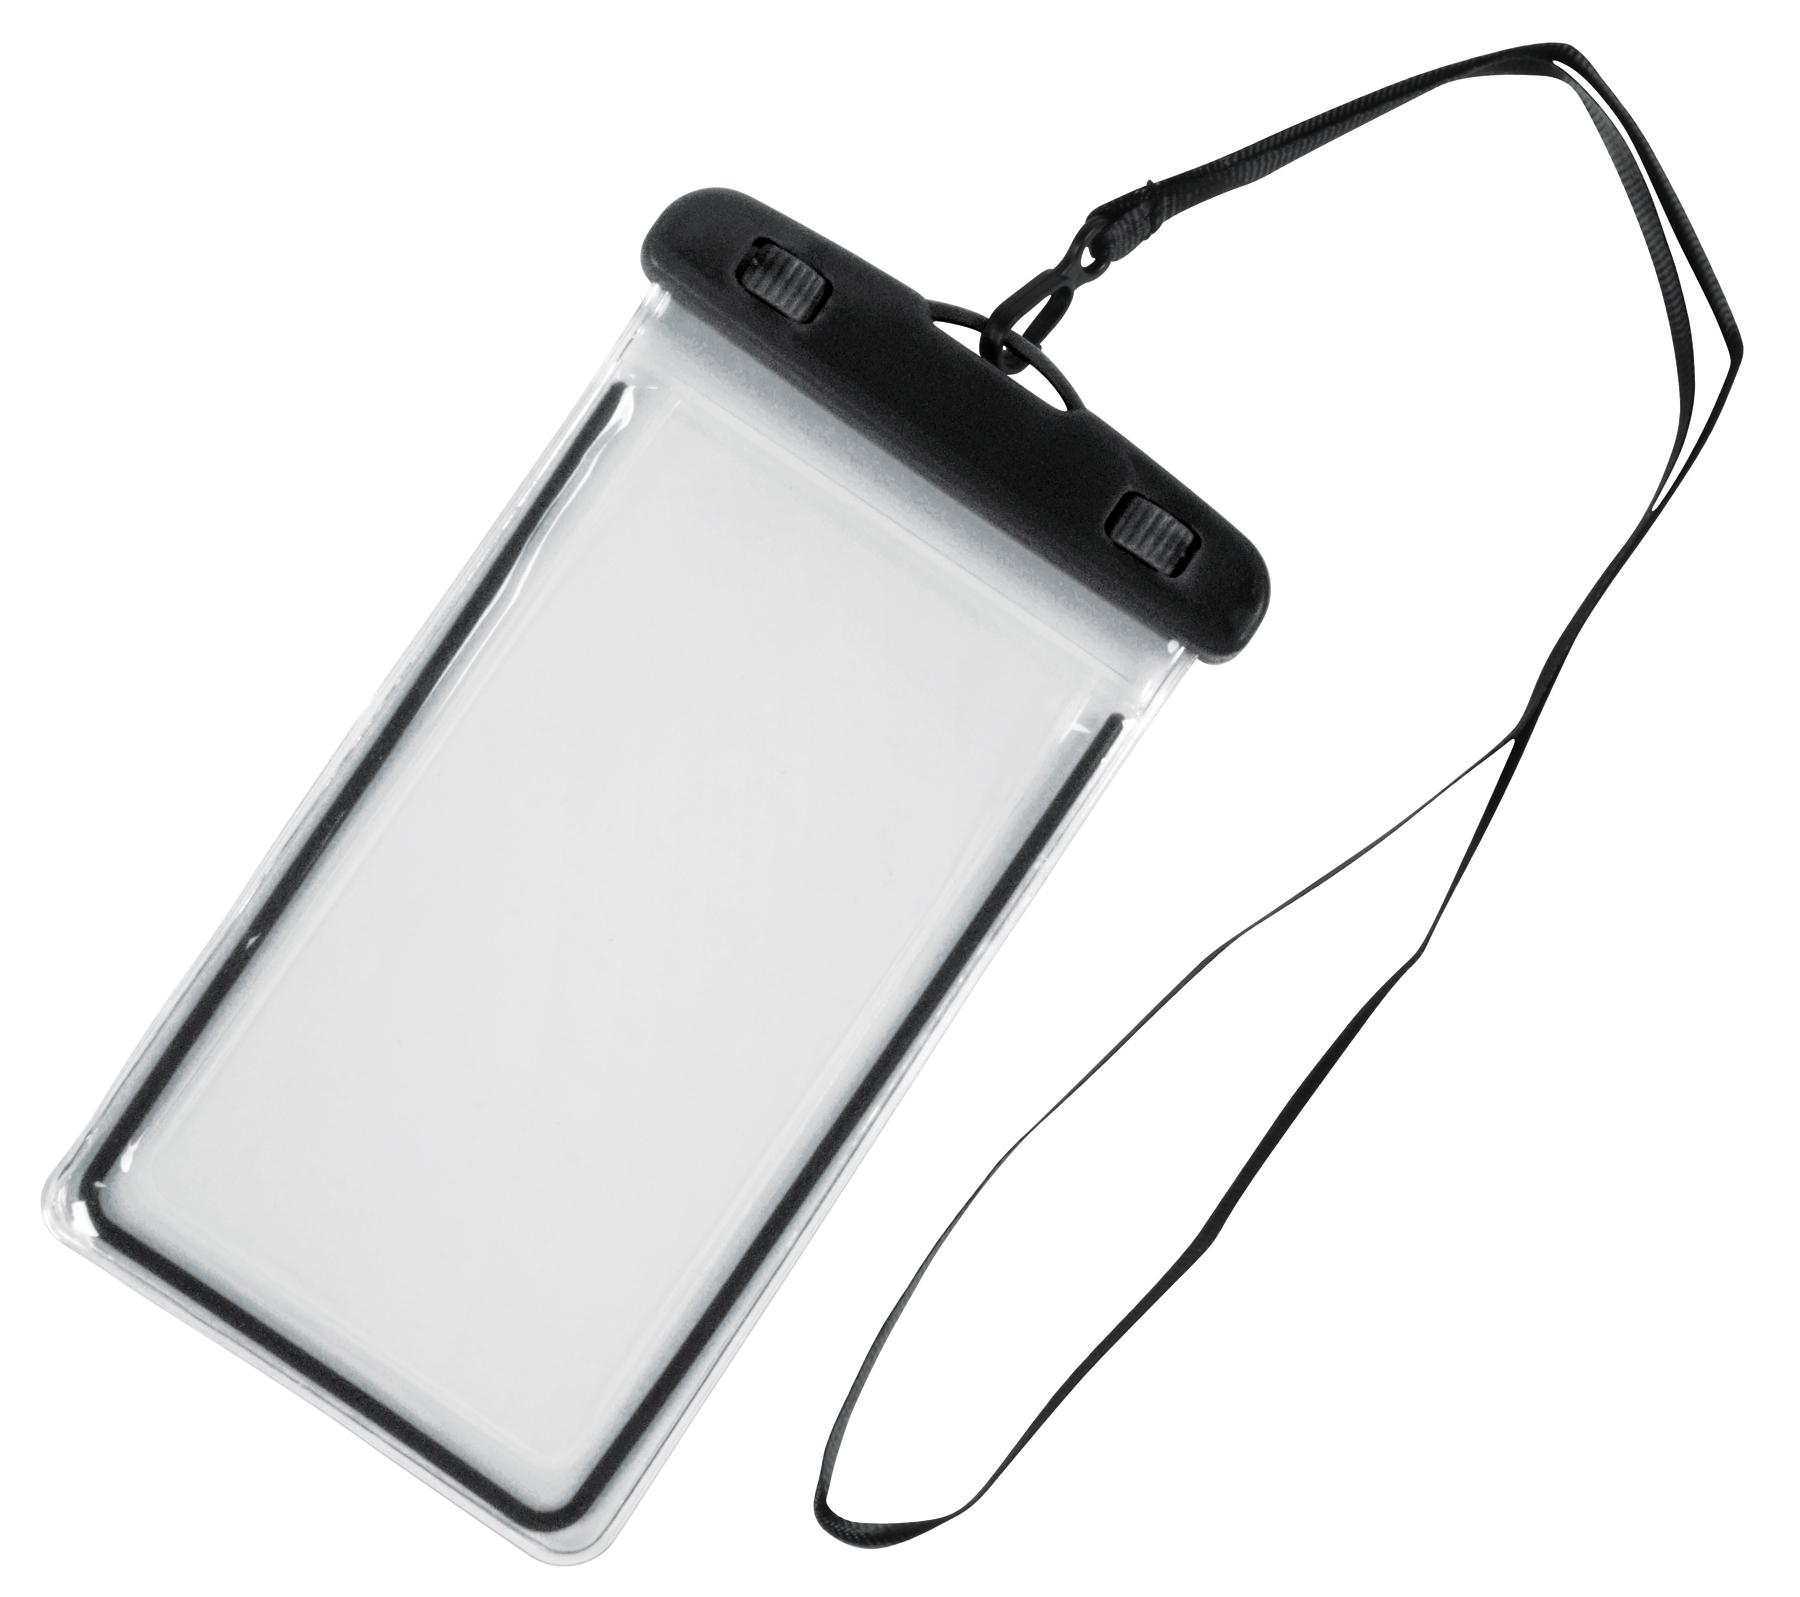 Torebka na telefon DIVER, czarny, transparentny